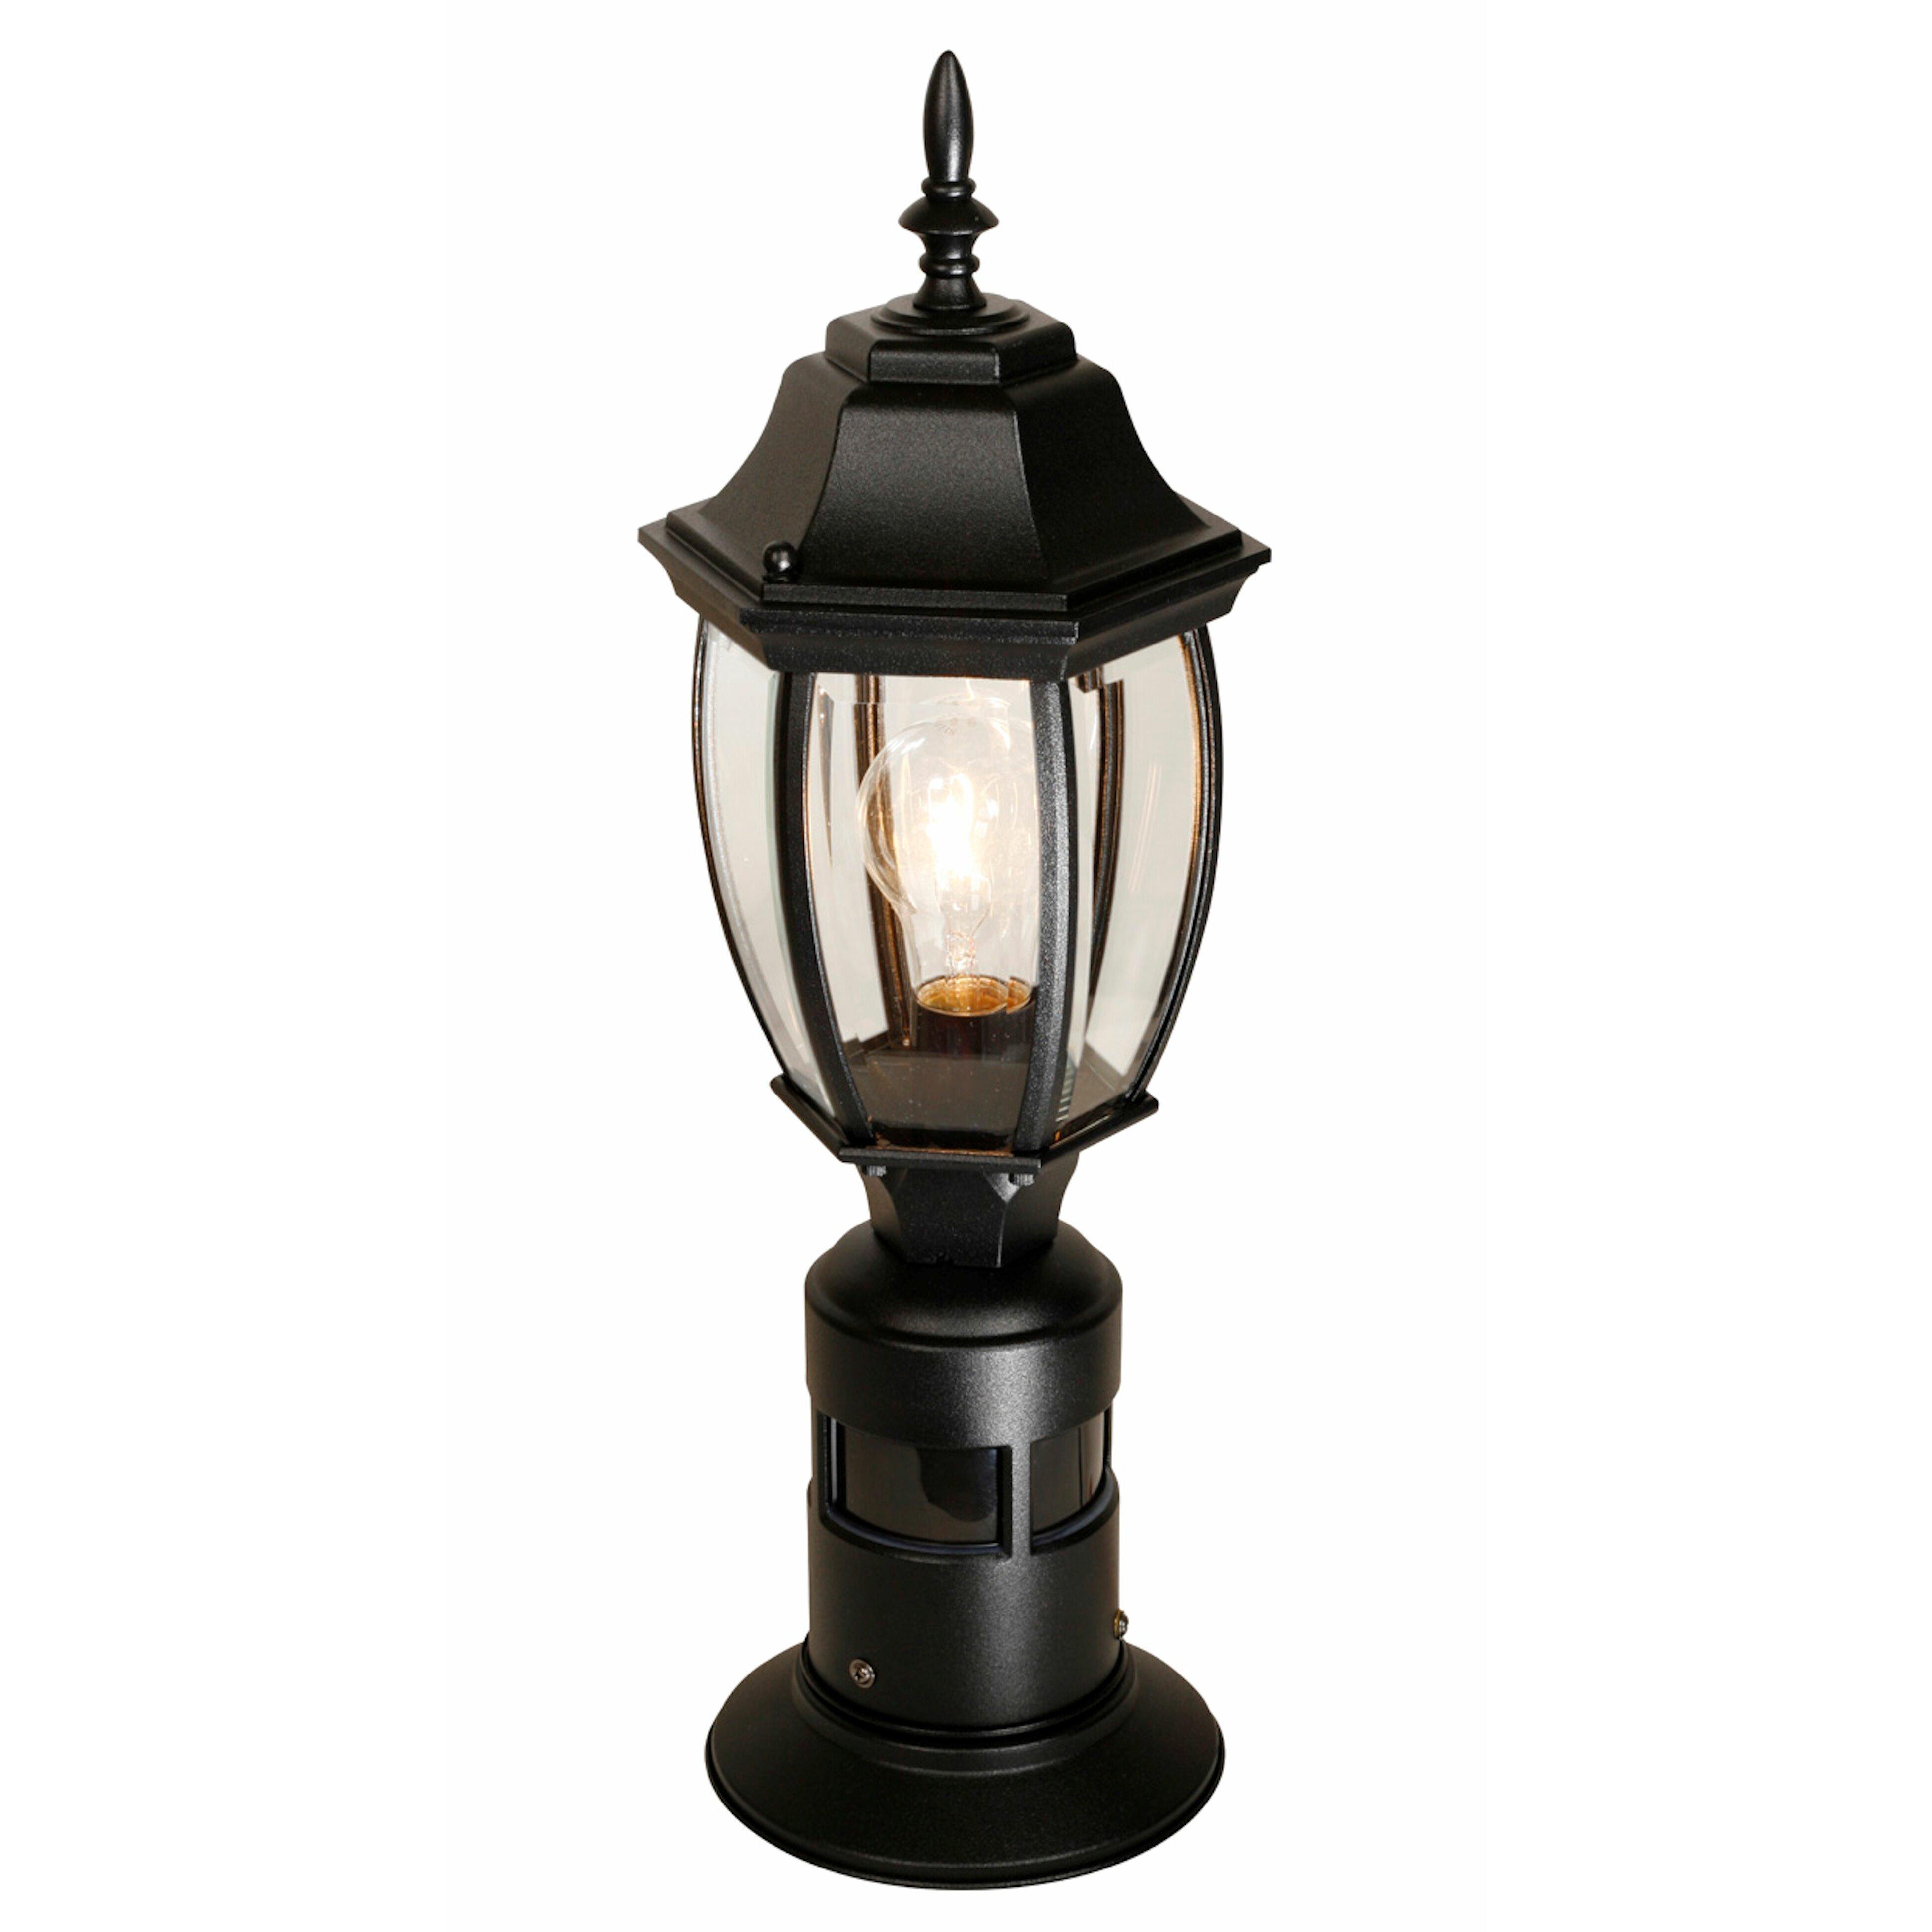 heath zenith outdoor 1 light pier mount light reviews. Black Bedroom Furniture Sets. Home Design Ideas